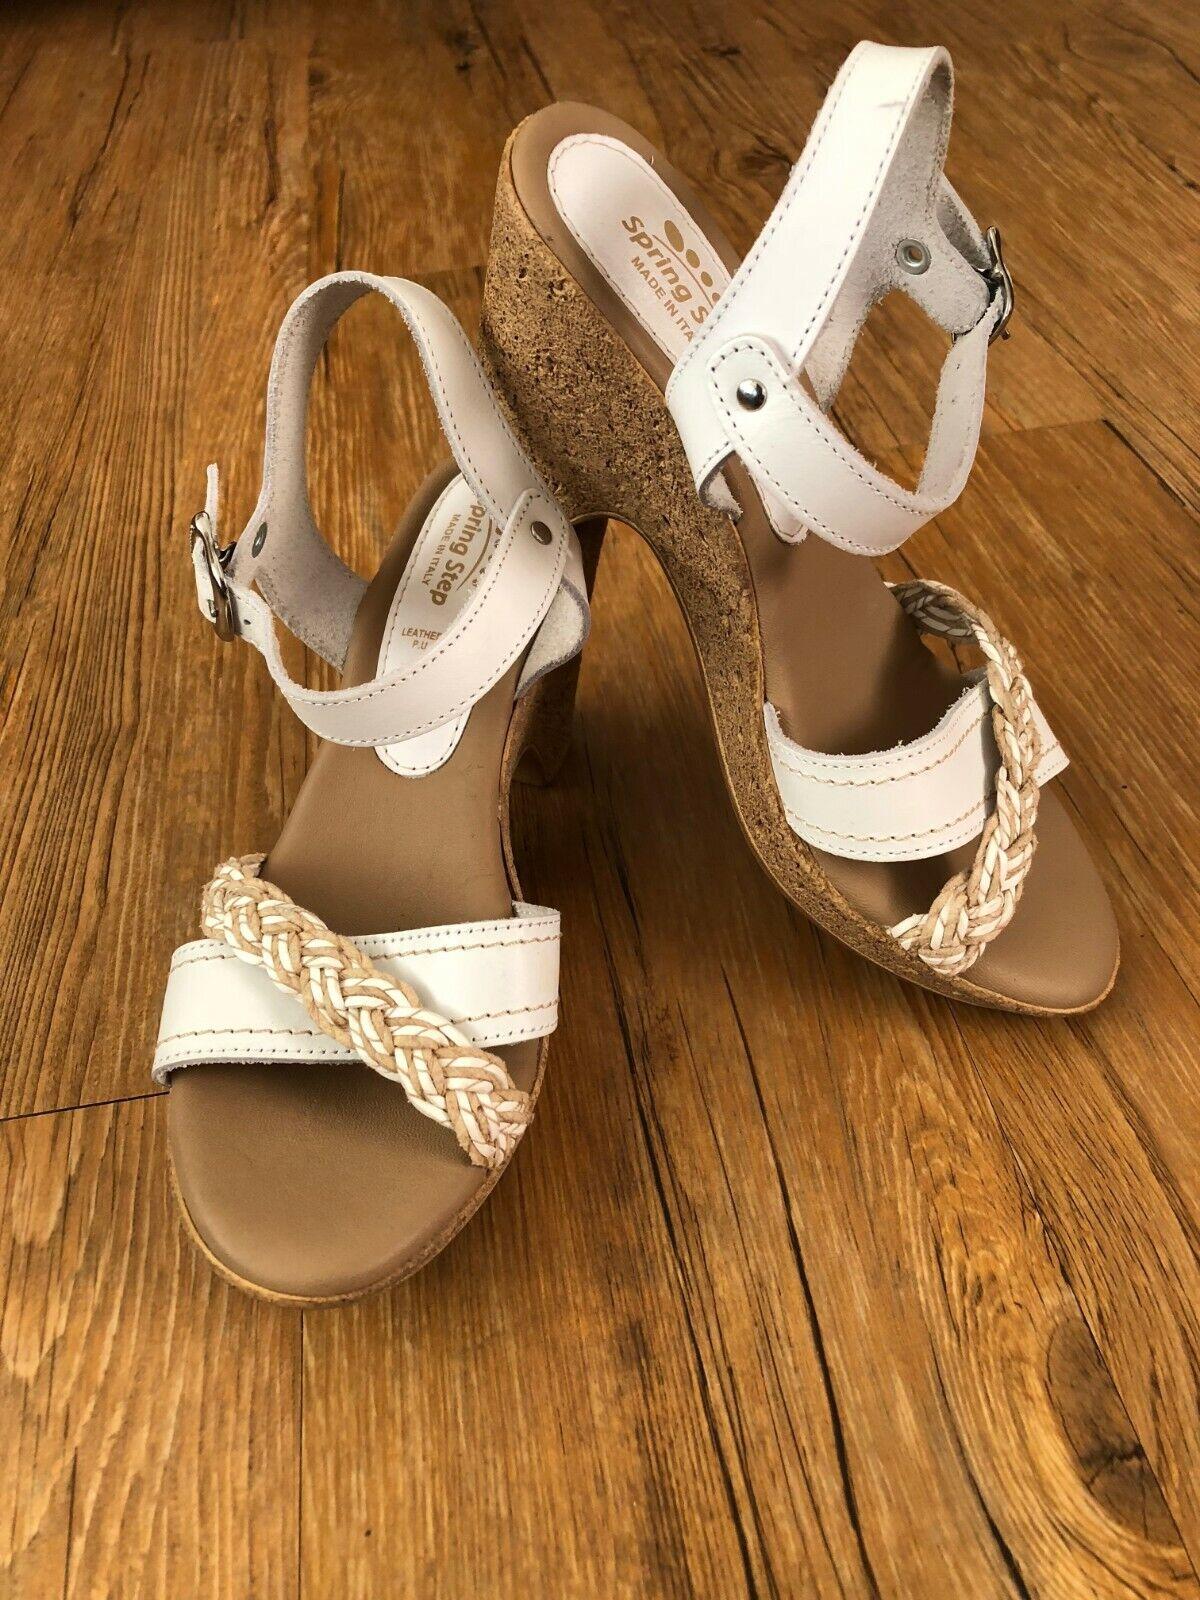 Spring Step Italy White Jute Braid Cork Wedge Leather Sandal 36/6 Never Worn